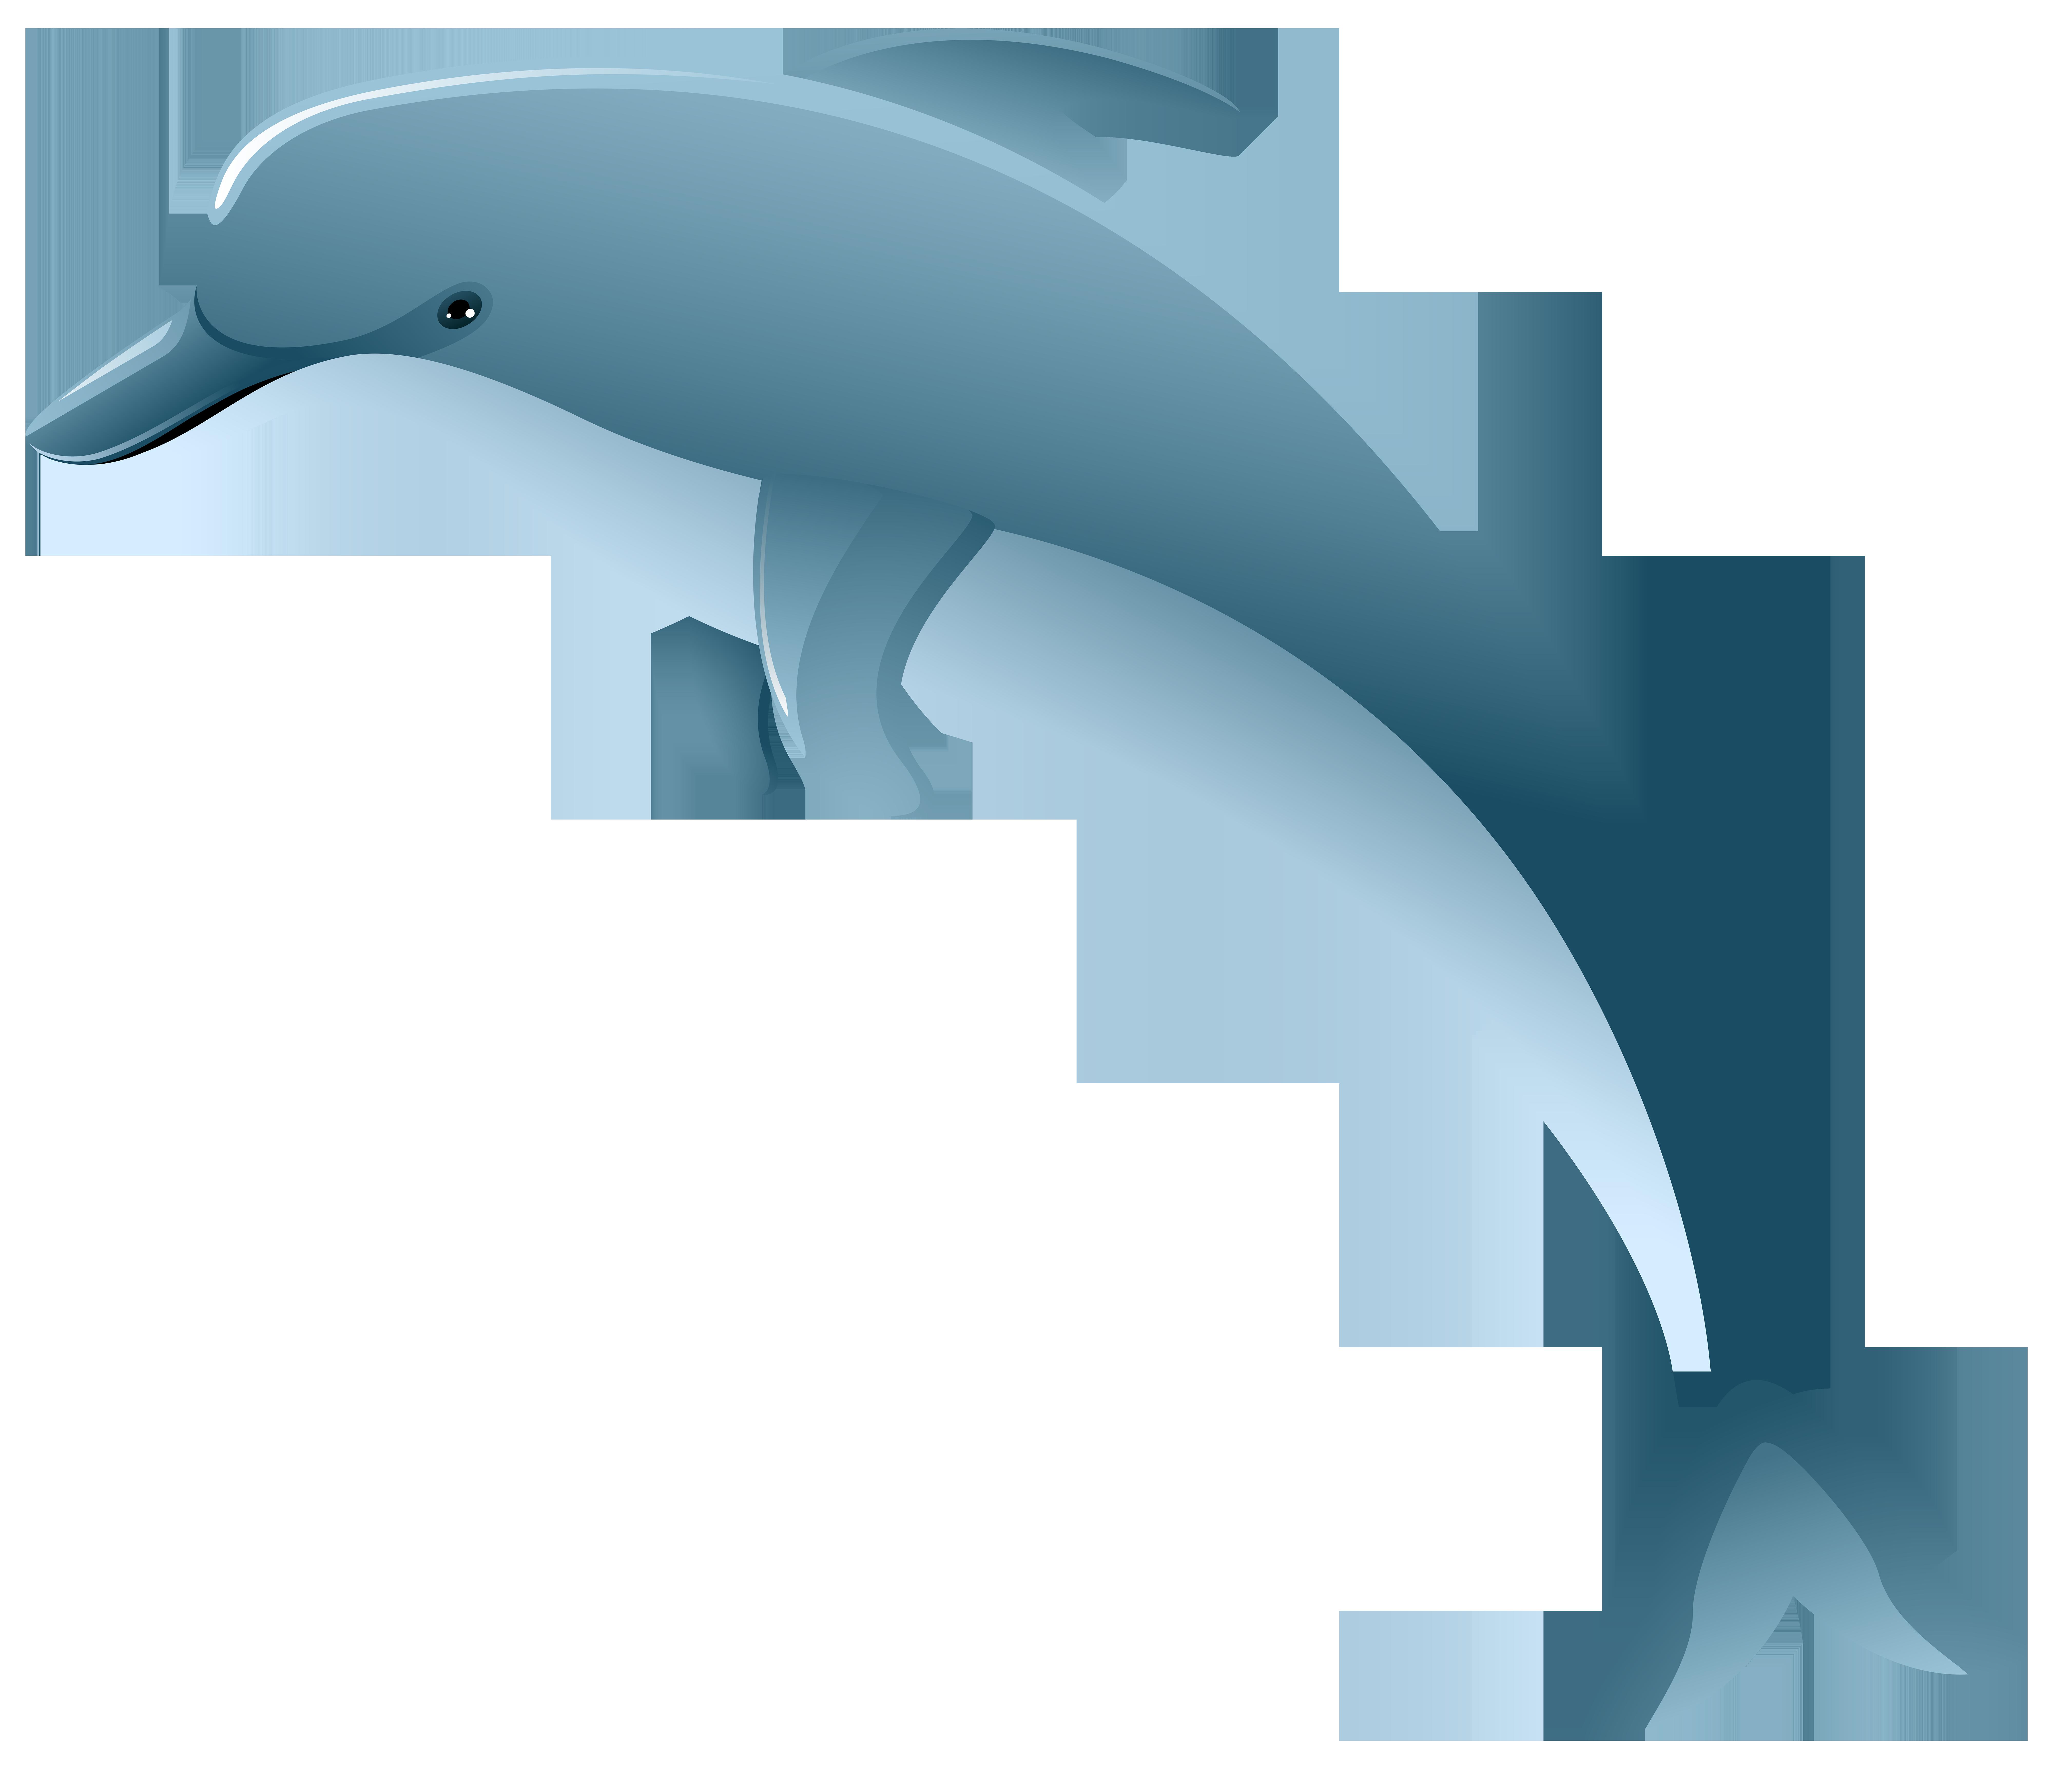 8000x6984 Dolphin Png Clip Art Imageu200b Gallery Yopriceville